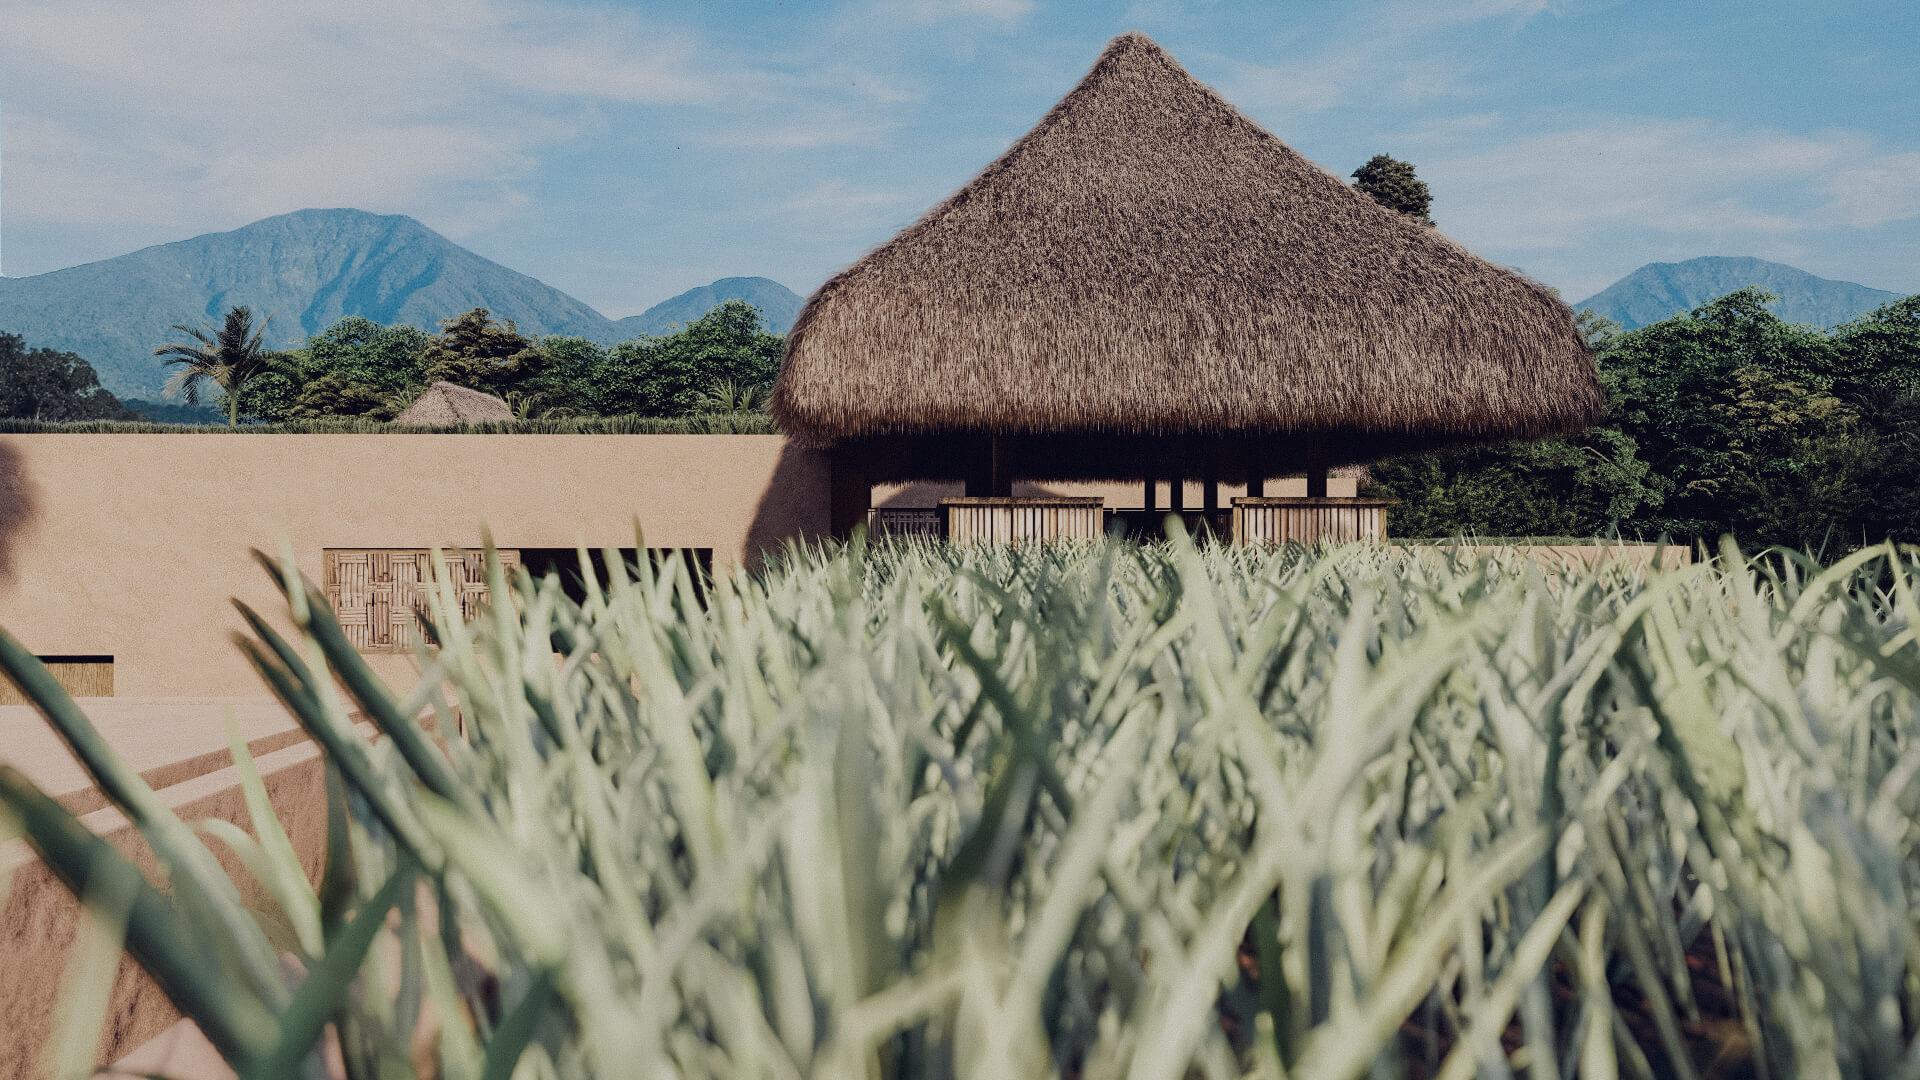 Rumah Besar Sembalun Lombok Architecture Roof Top